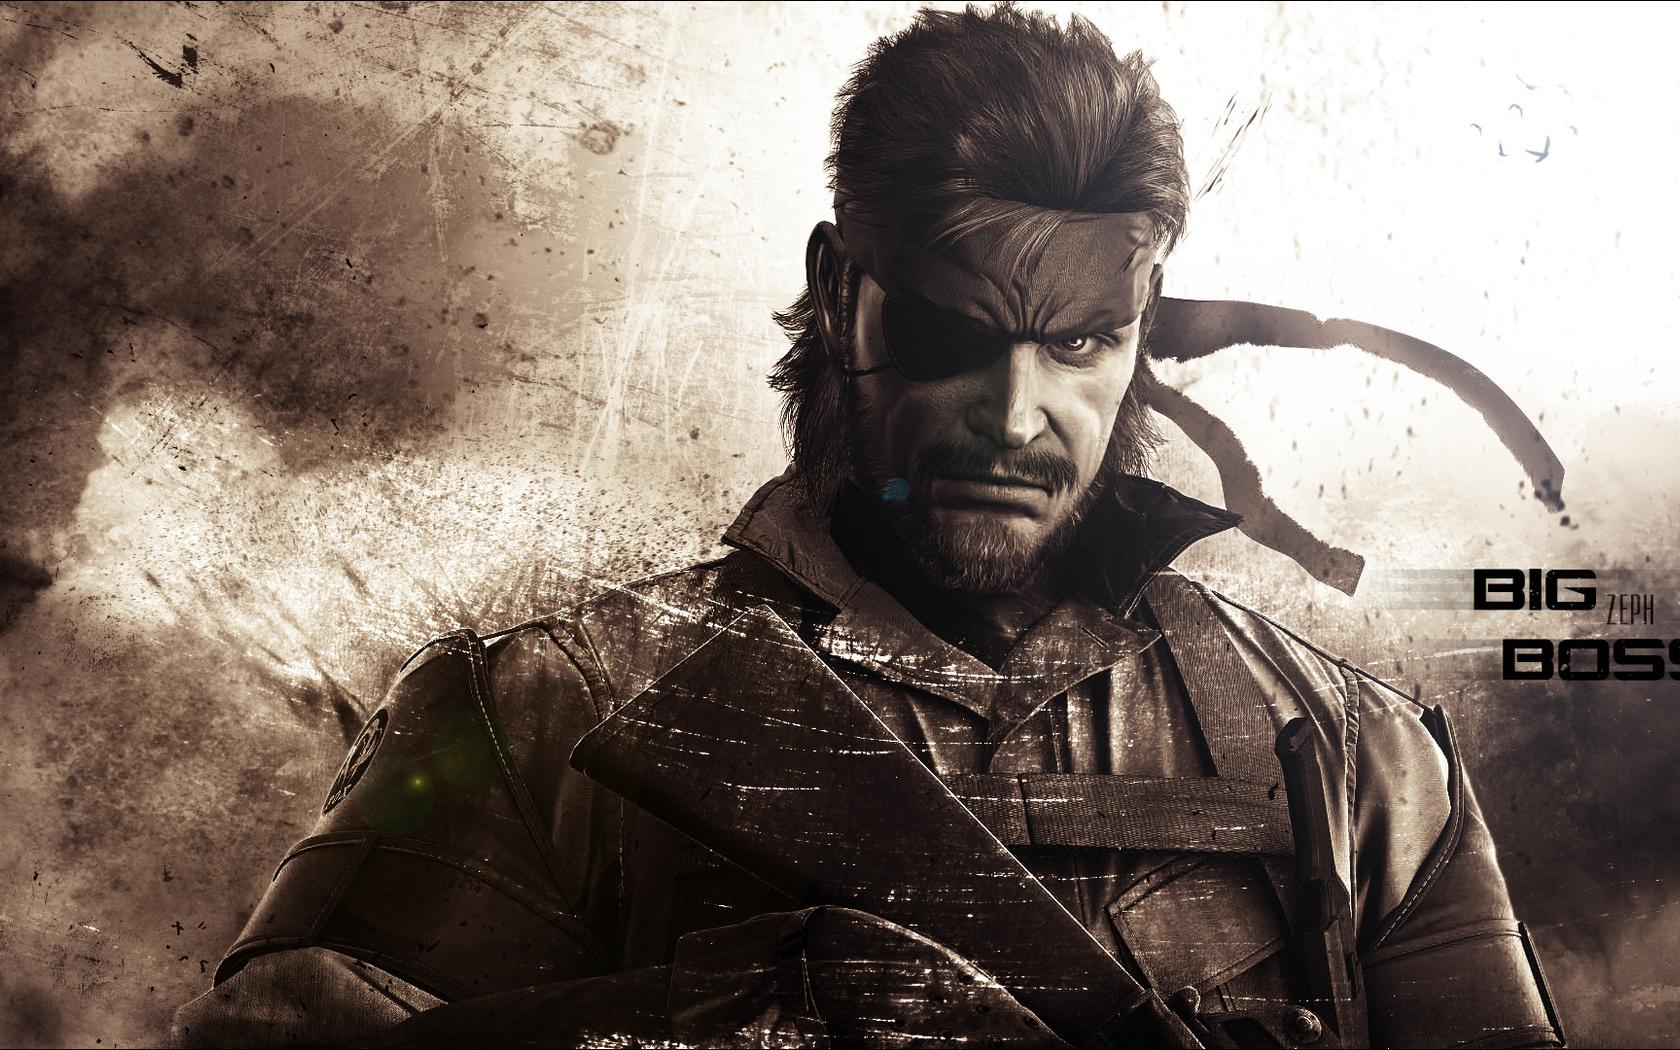 Metal Gear Solid Wallpapers Hd - HD Wallpaper